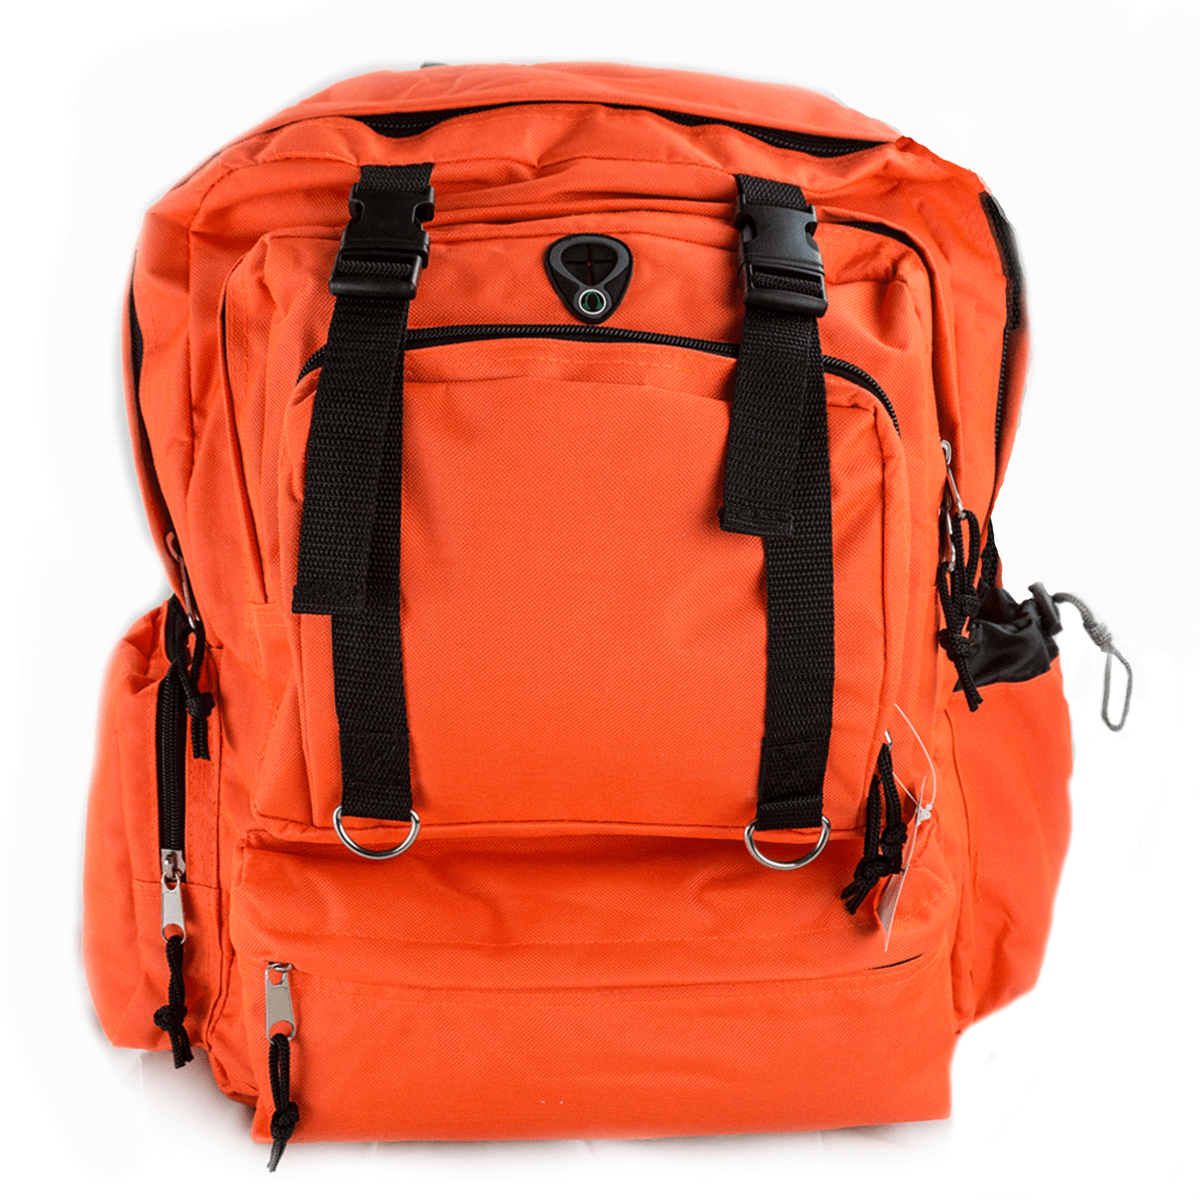 Deluxe Orange Back Pack